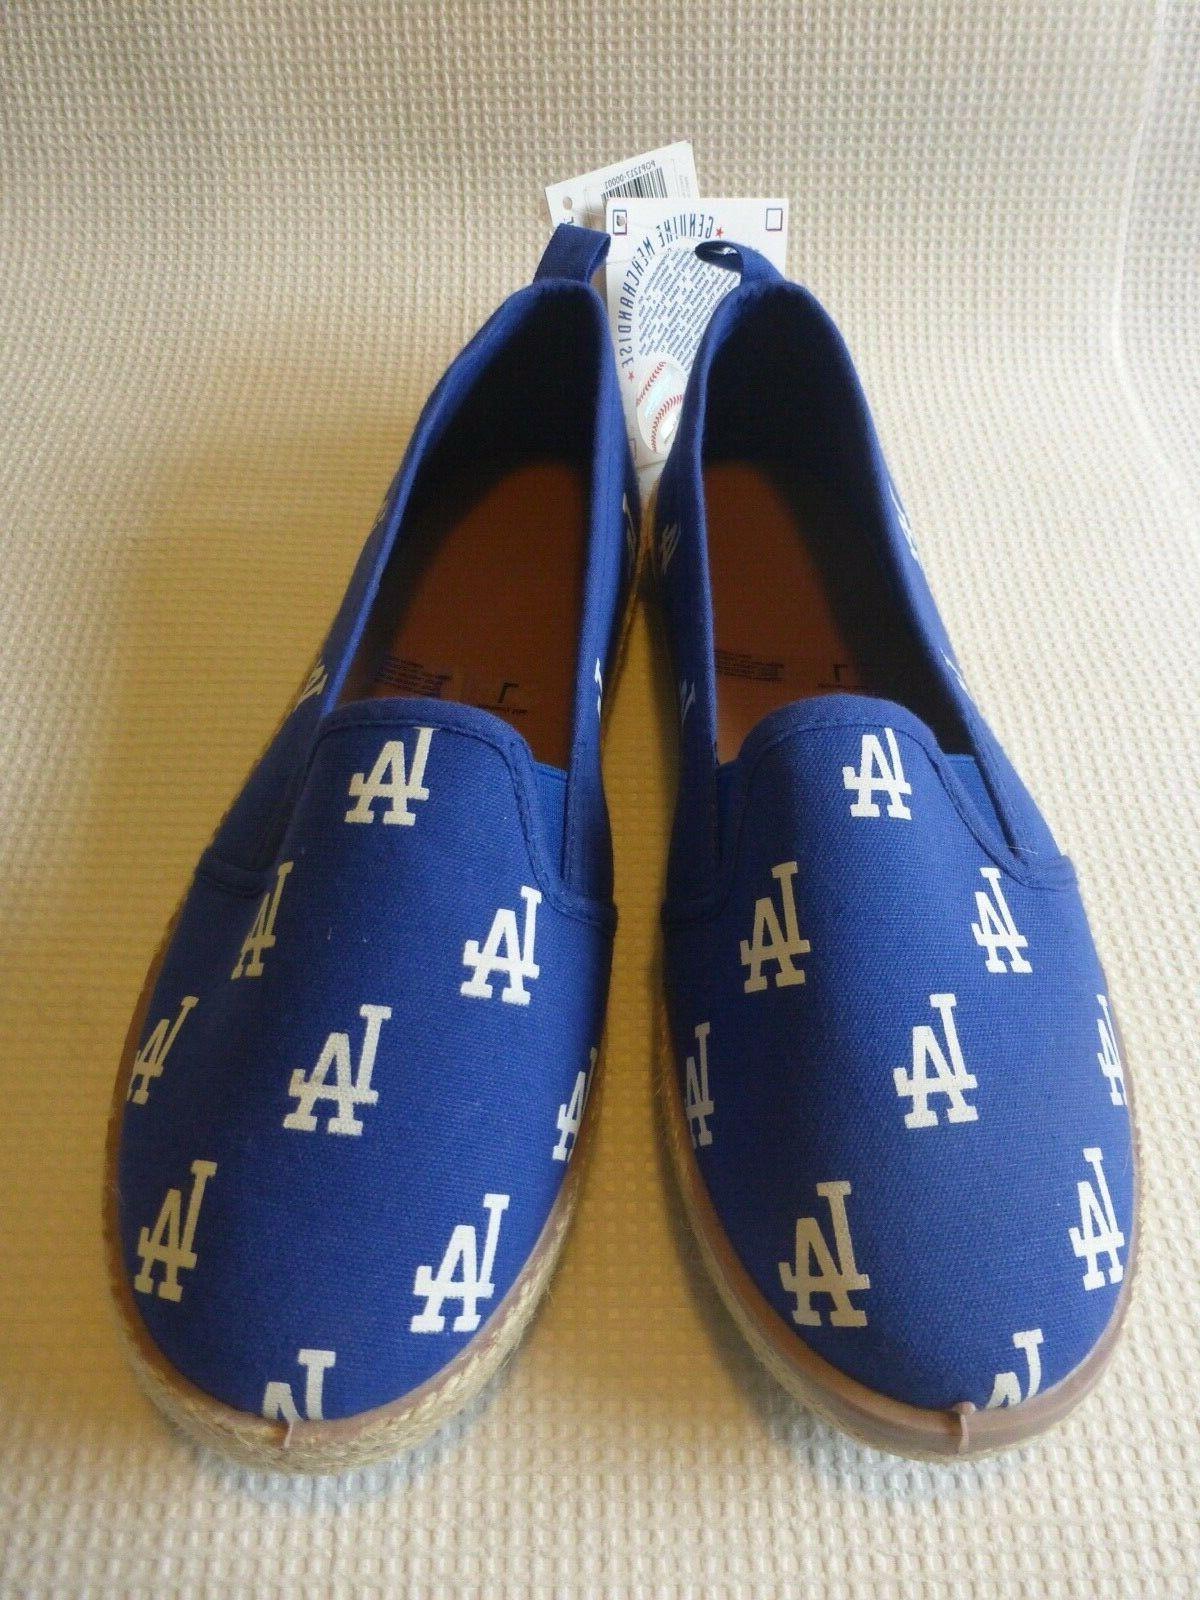 los angeles dodgers womens canvas shoes size